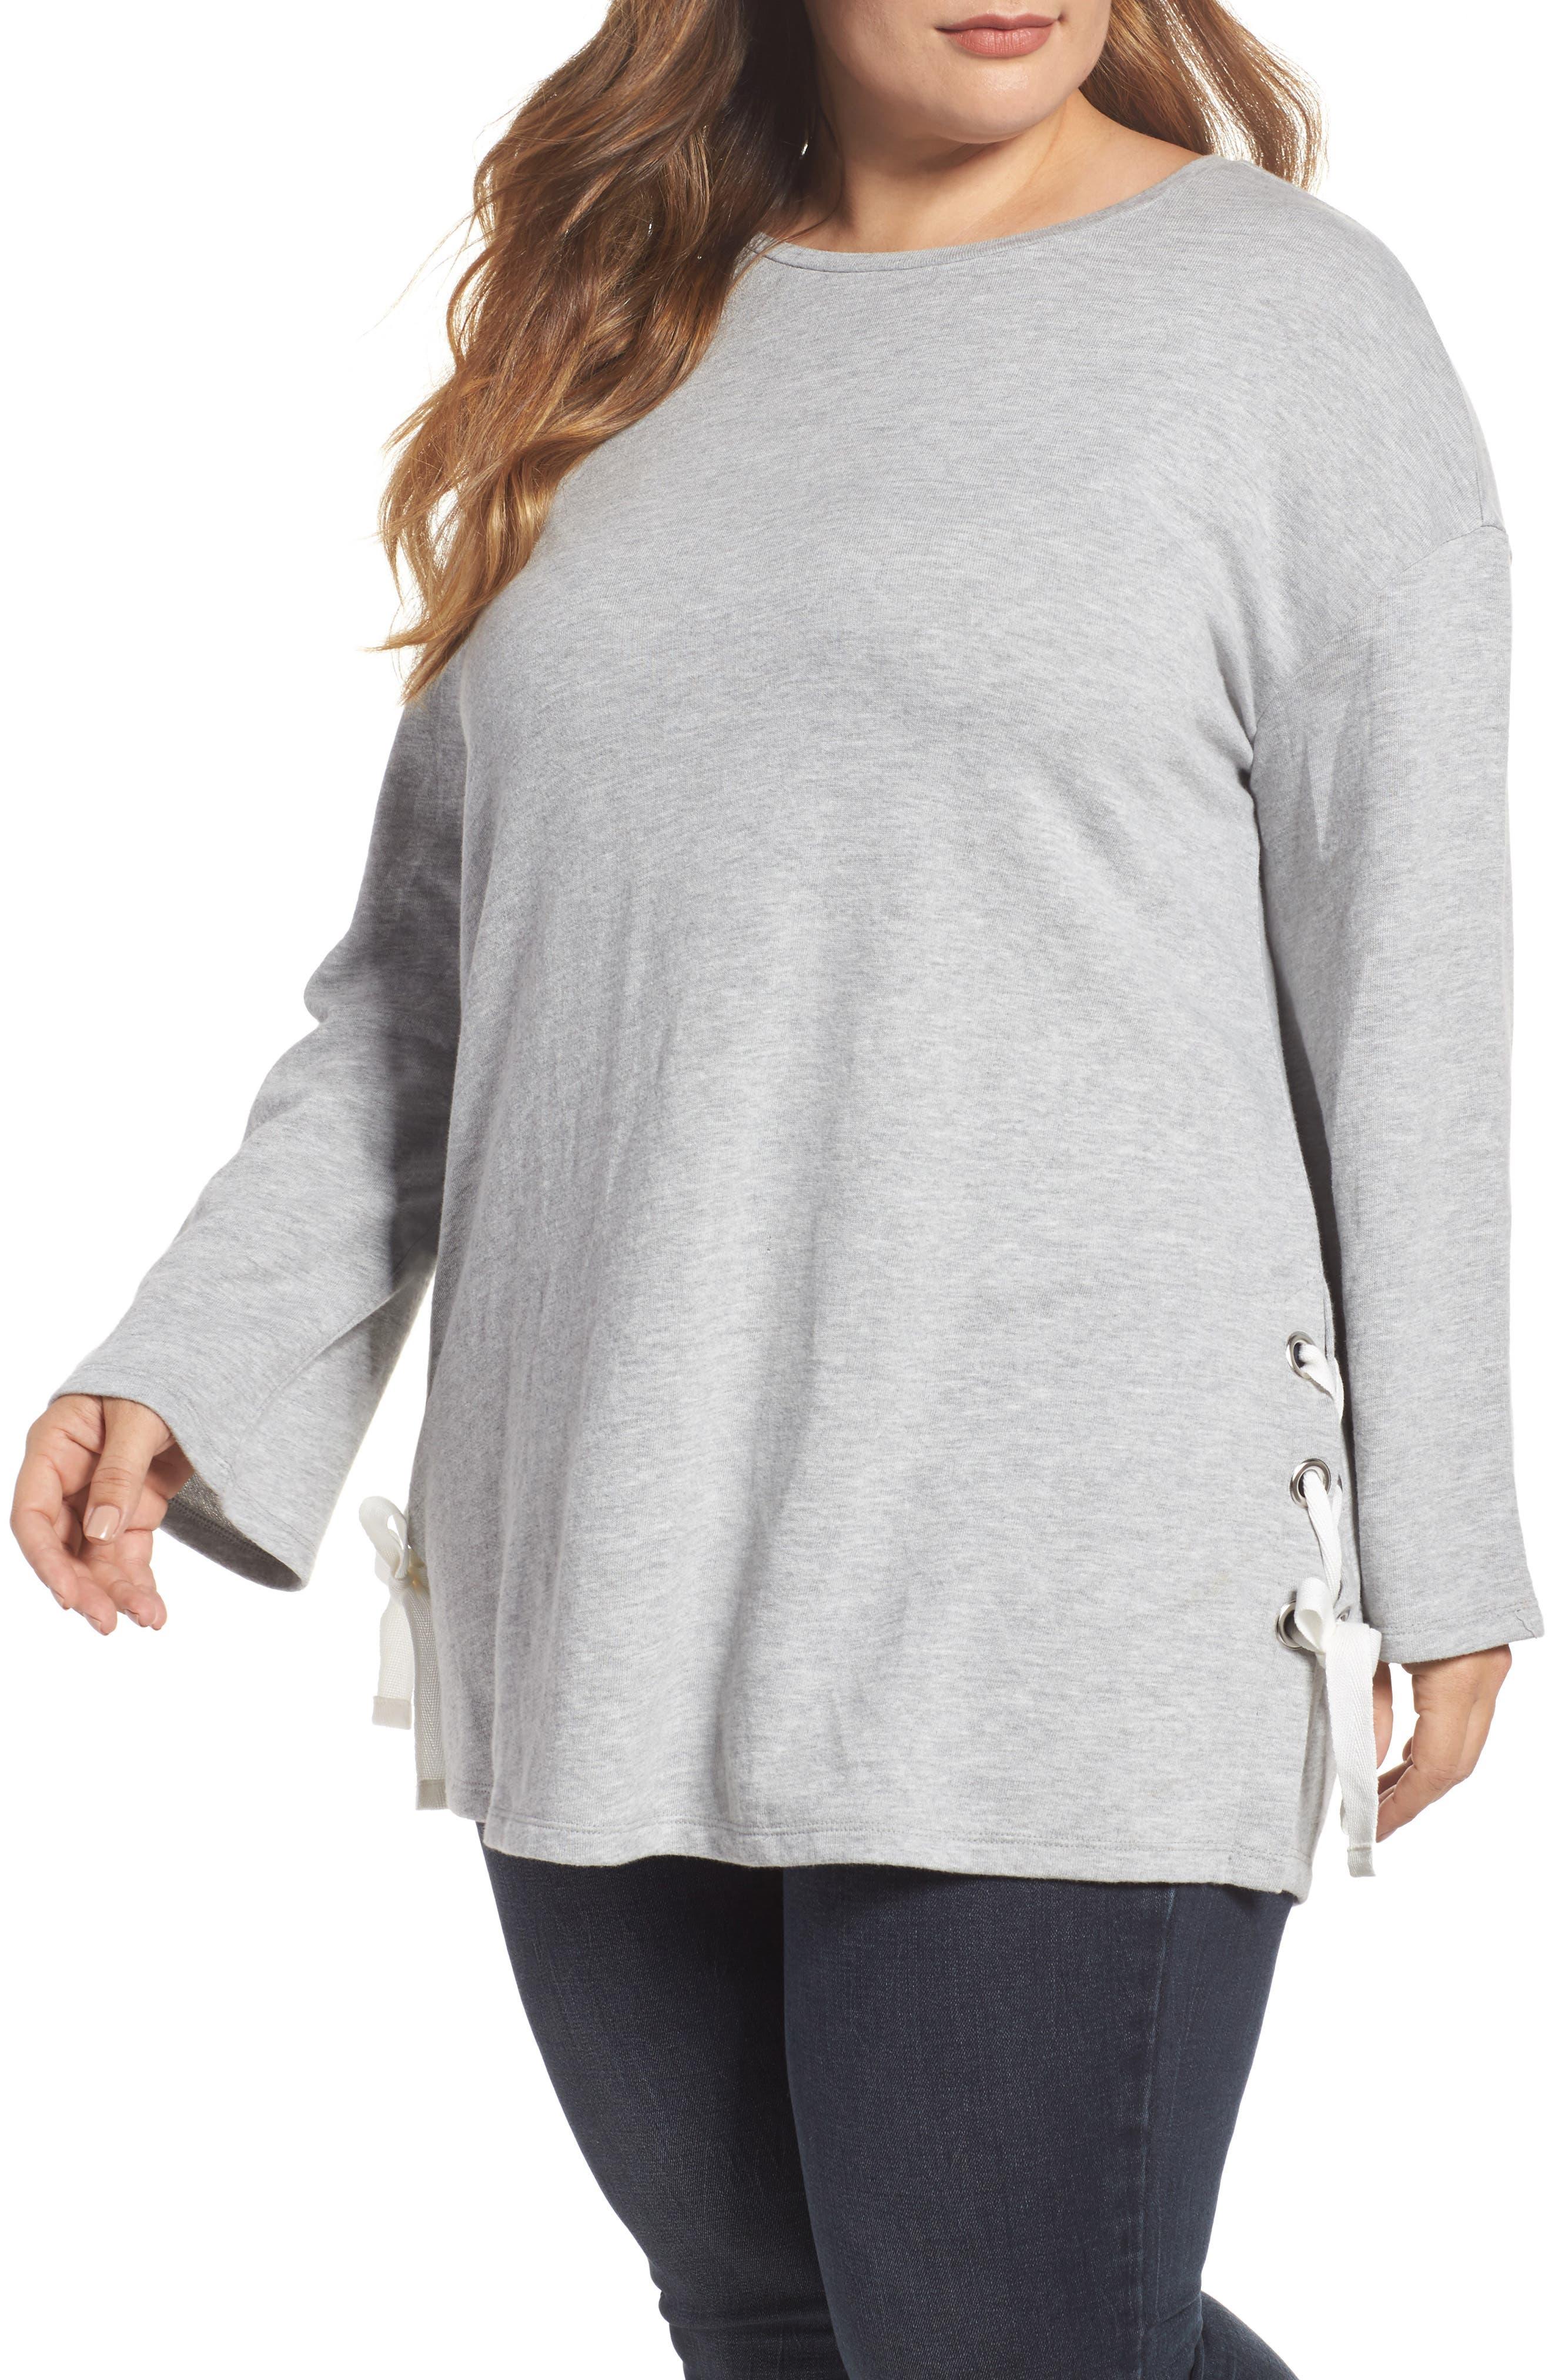 Lace-Up Side Sweatshirt,                             Main thumbnail 1, color,                             Grey Heather